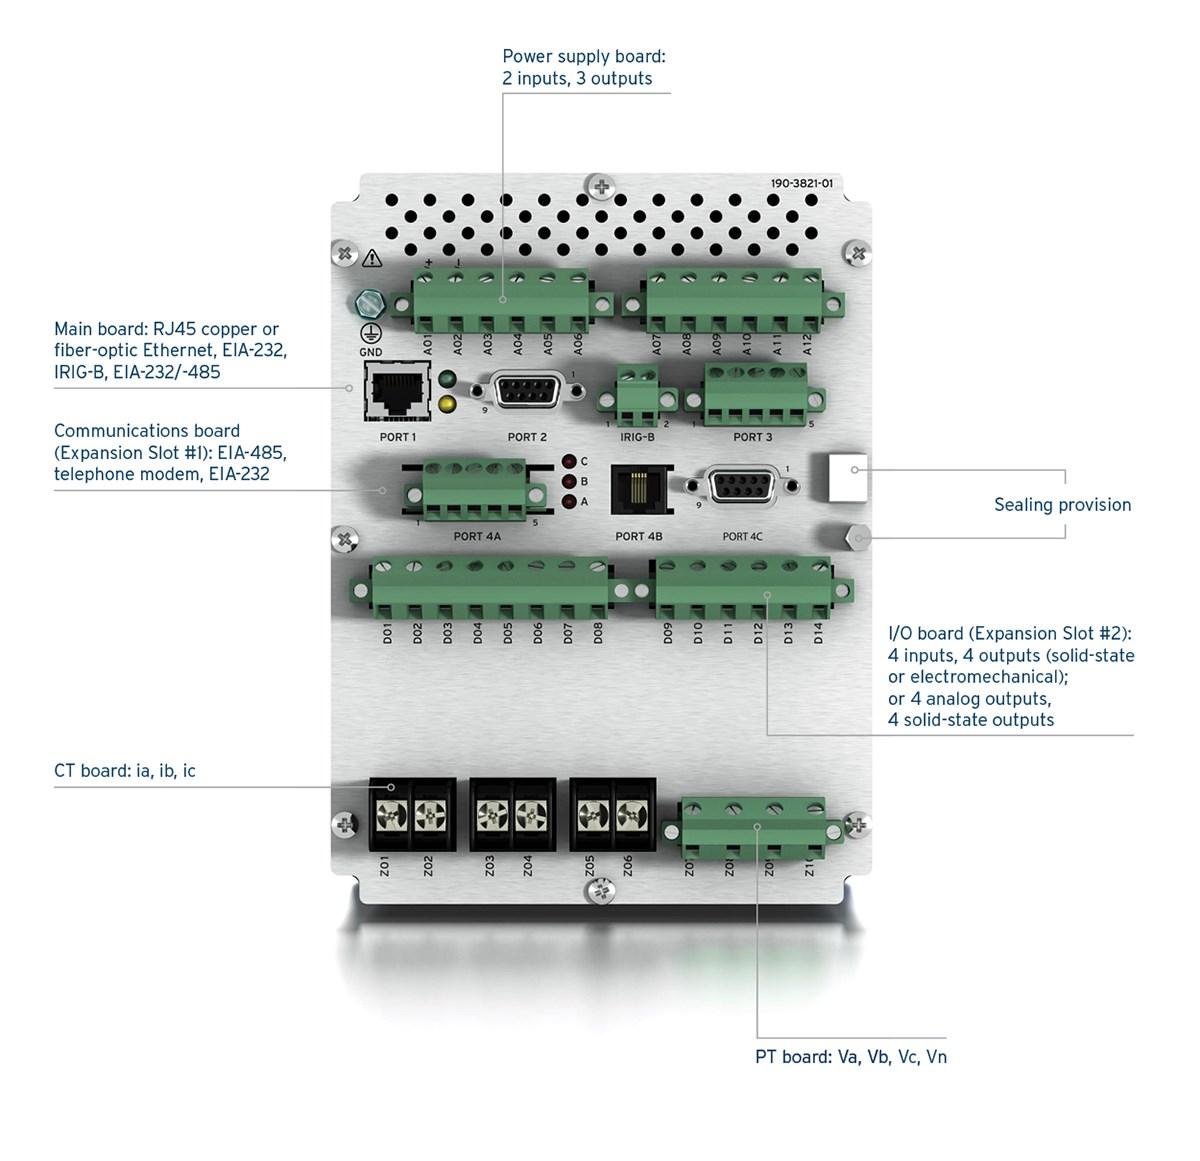 sel 735 power quality and revenue meter schweitzer engineering rh selinc com